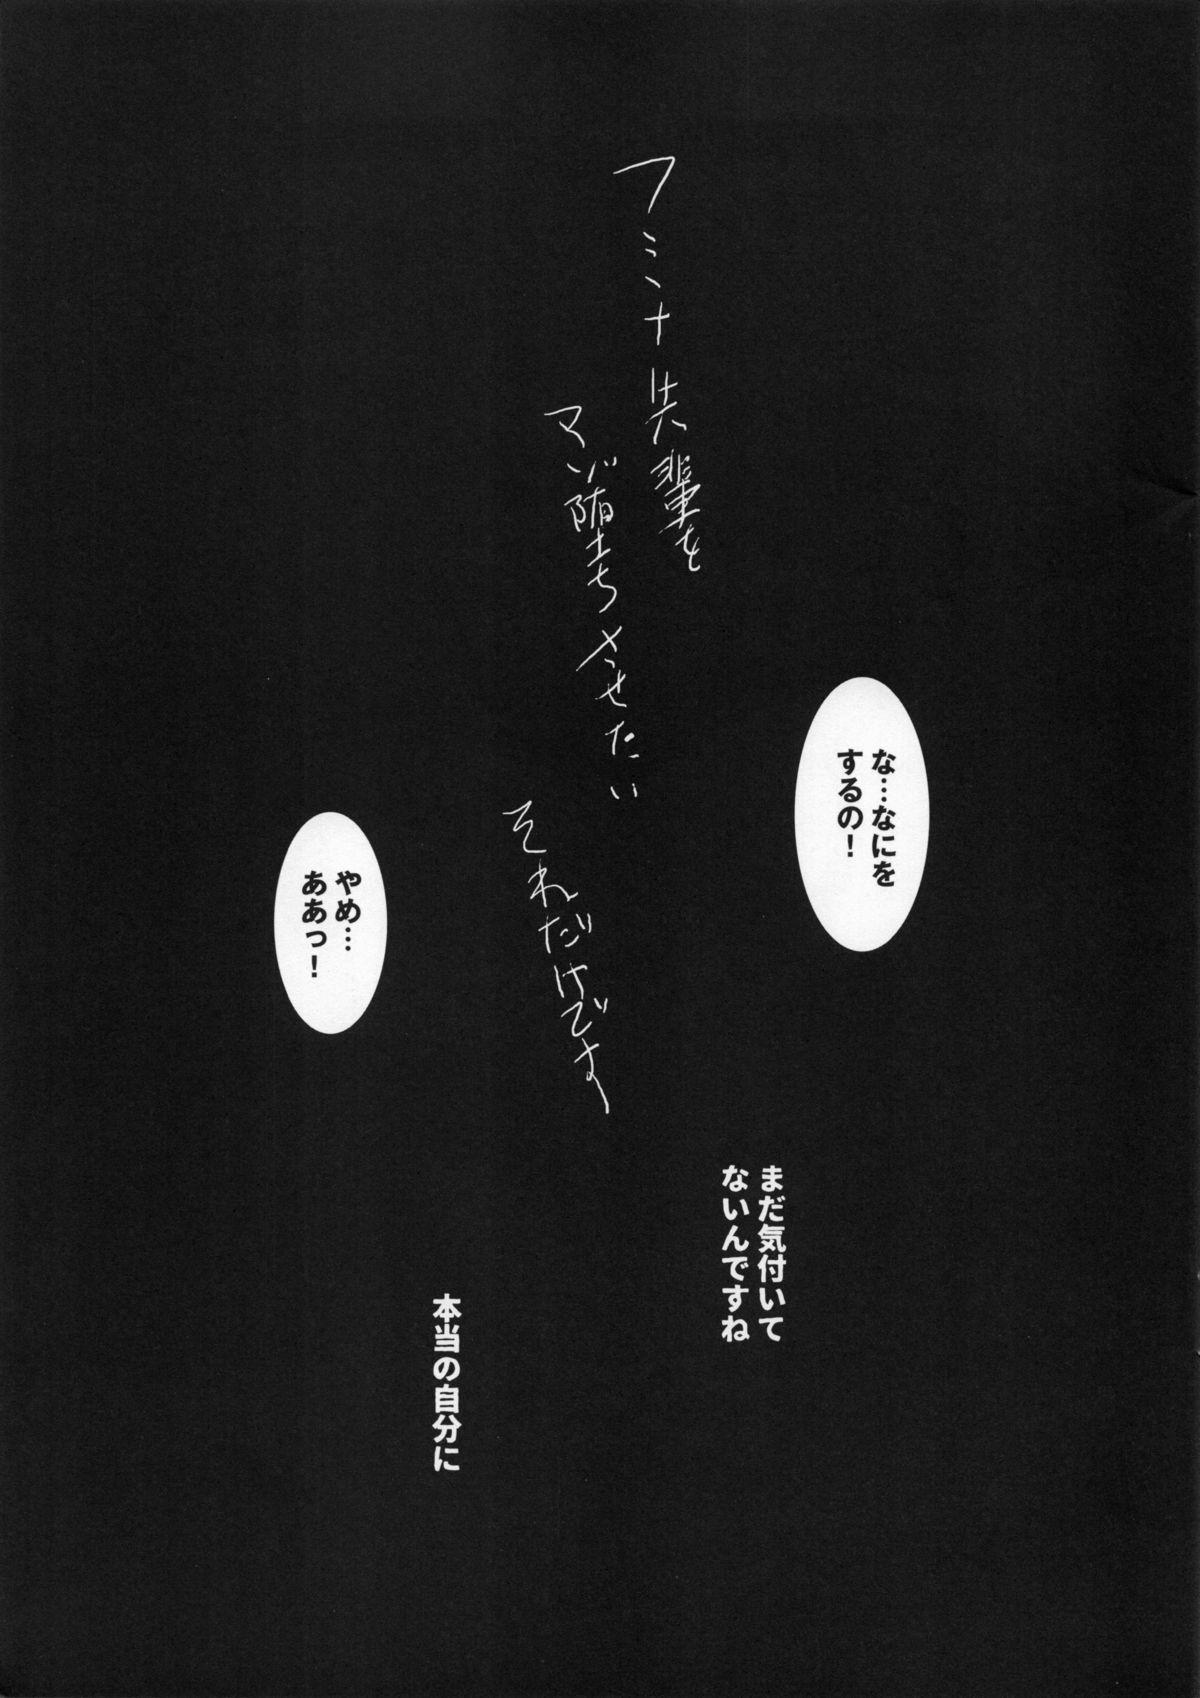 Fumina Biyakuochi Mazo Sex Try 1